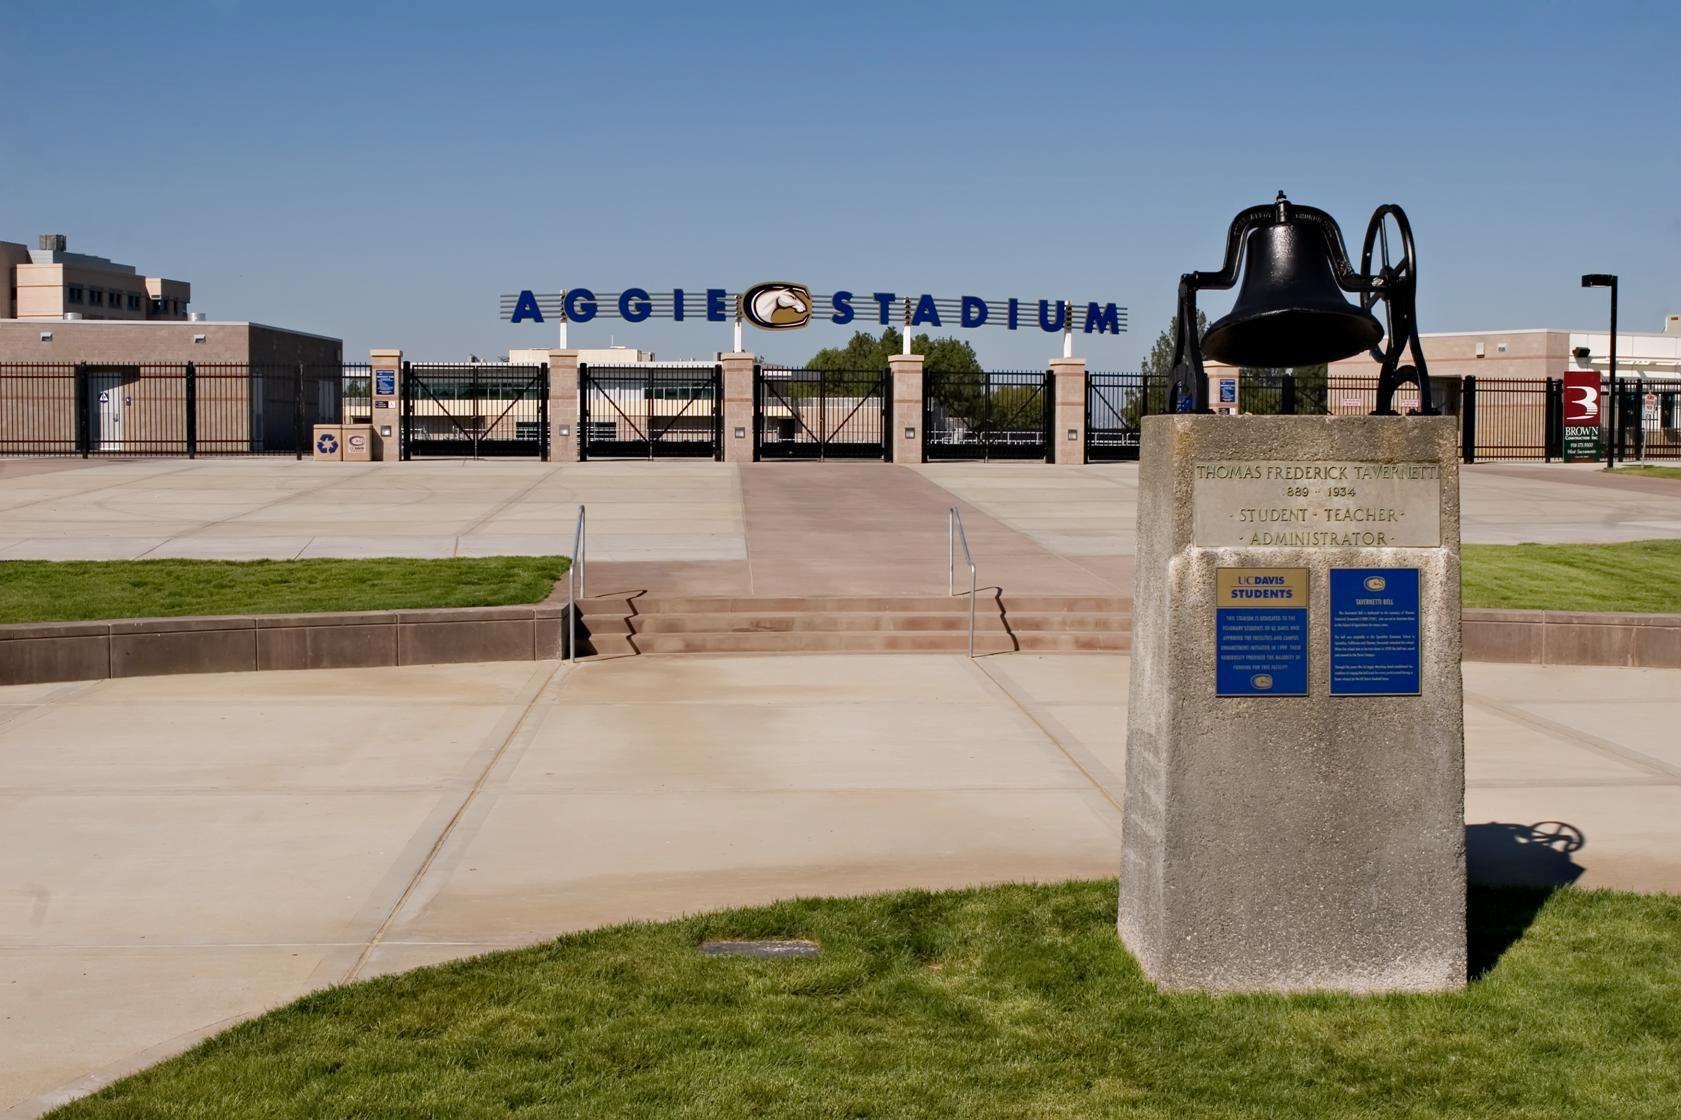 Aggie Stadium Victorious, San francisco bay area, Belle